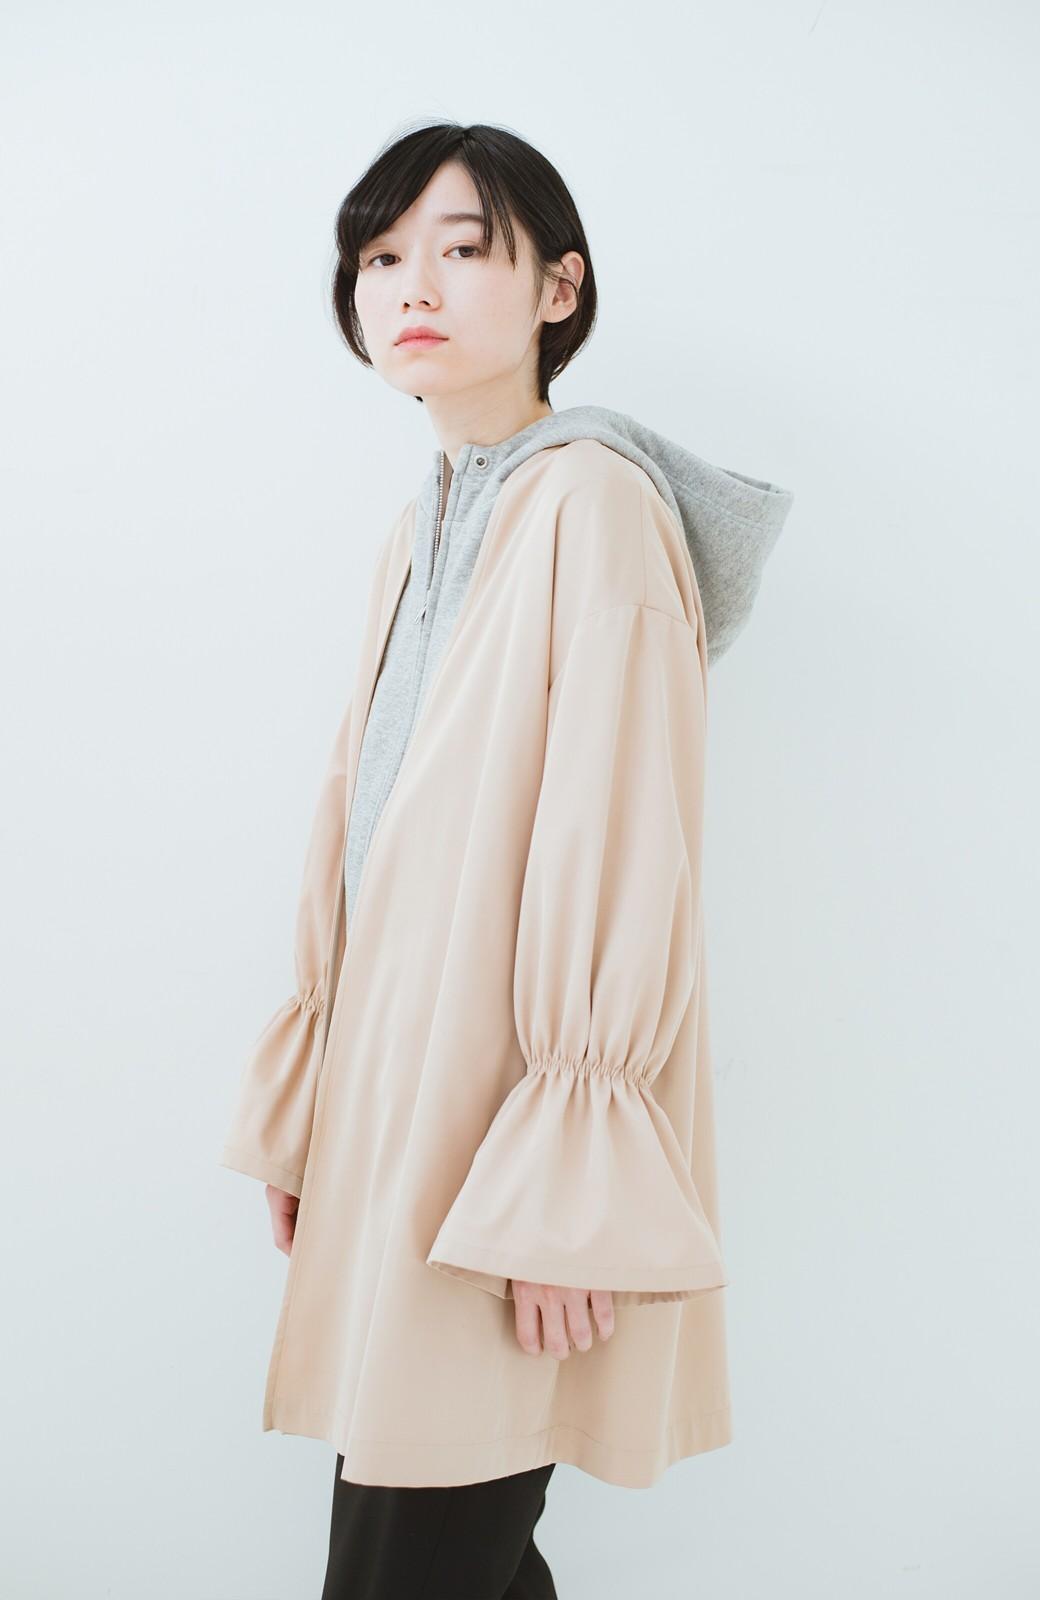 haco! ただ羽織るだけでオシャレに見える 気軽なフレアースリーブコート <ベージュ>の商品写真19